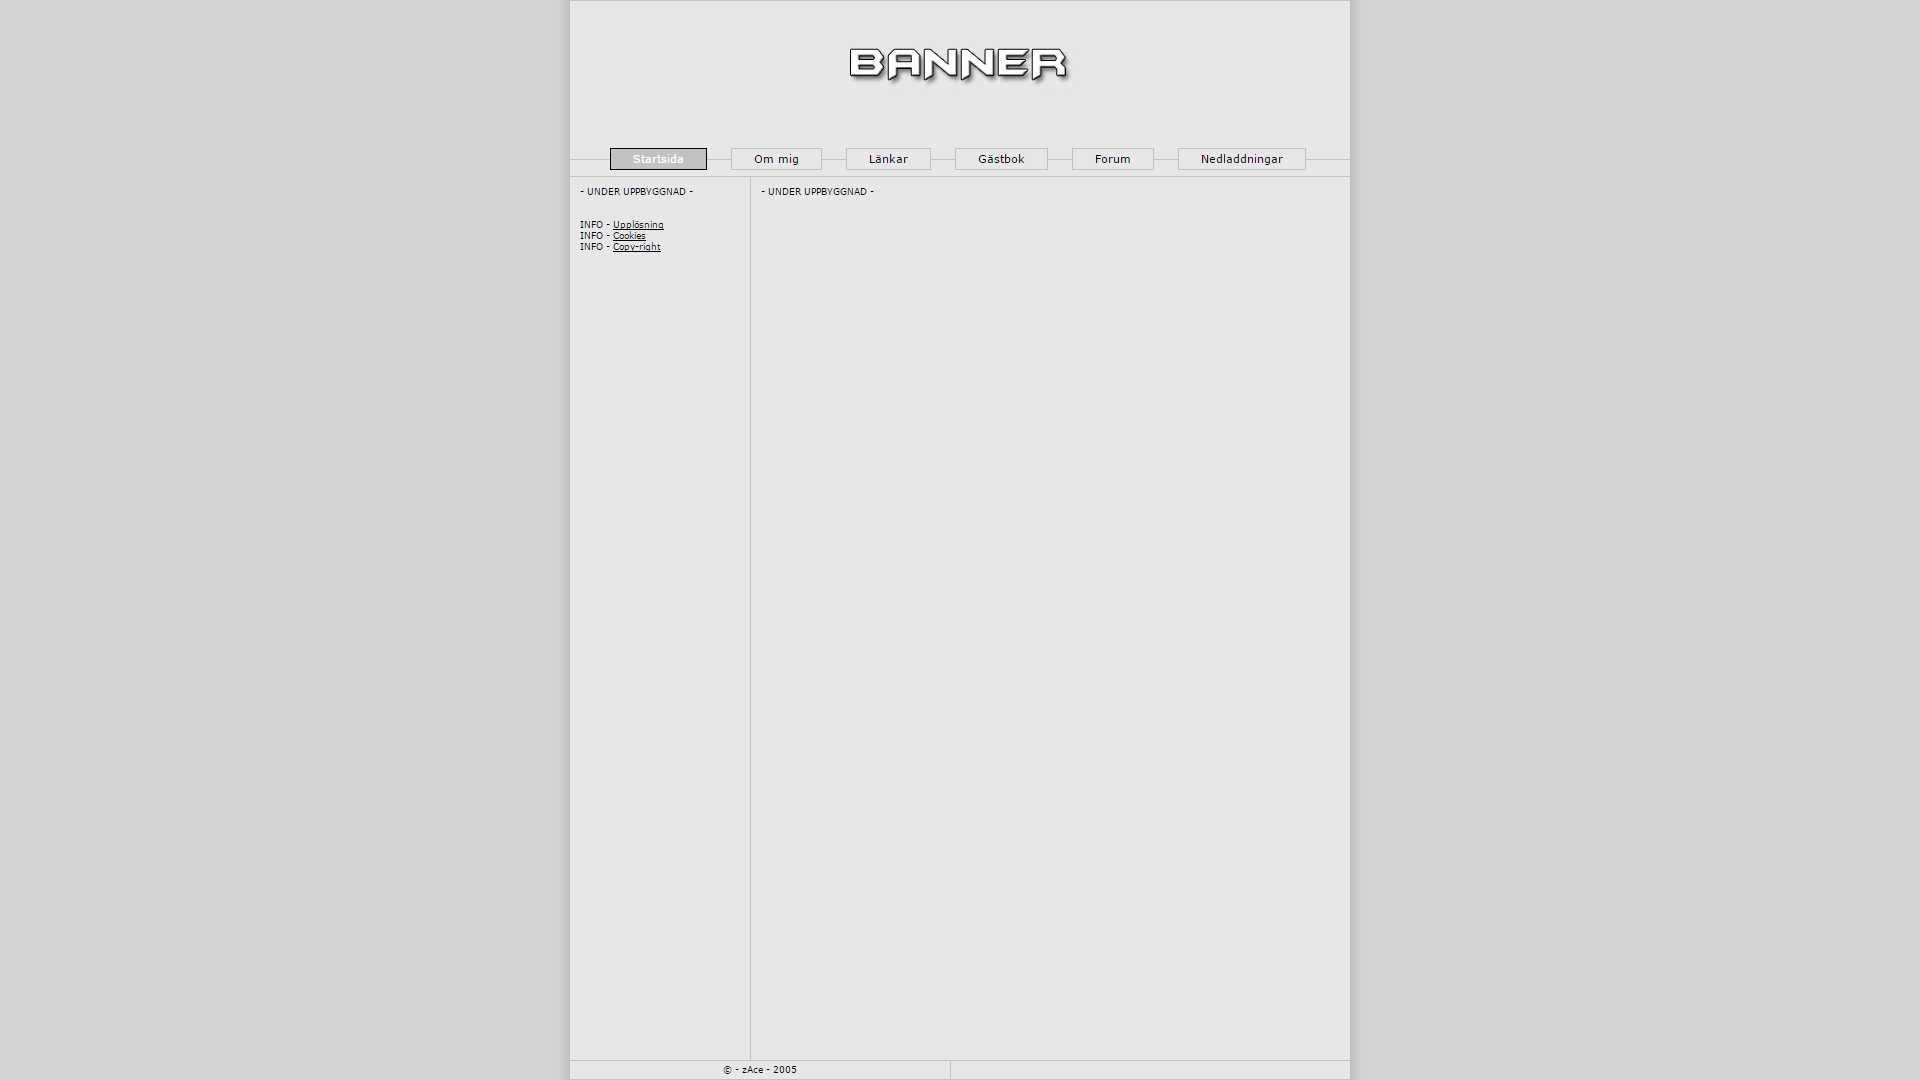 simple-style-v2/assets/images/screenshot.png